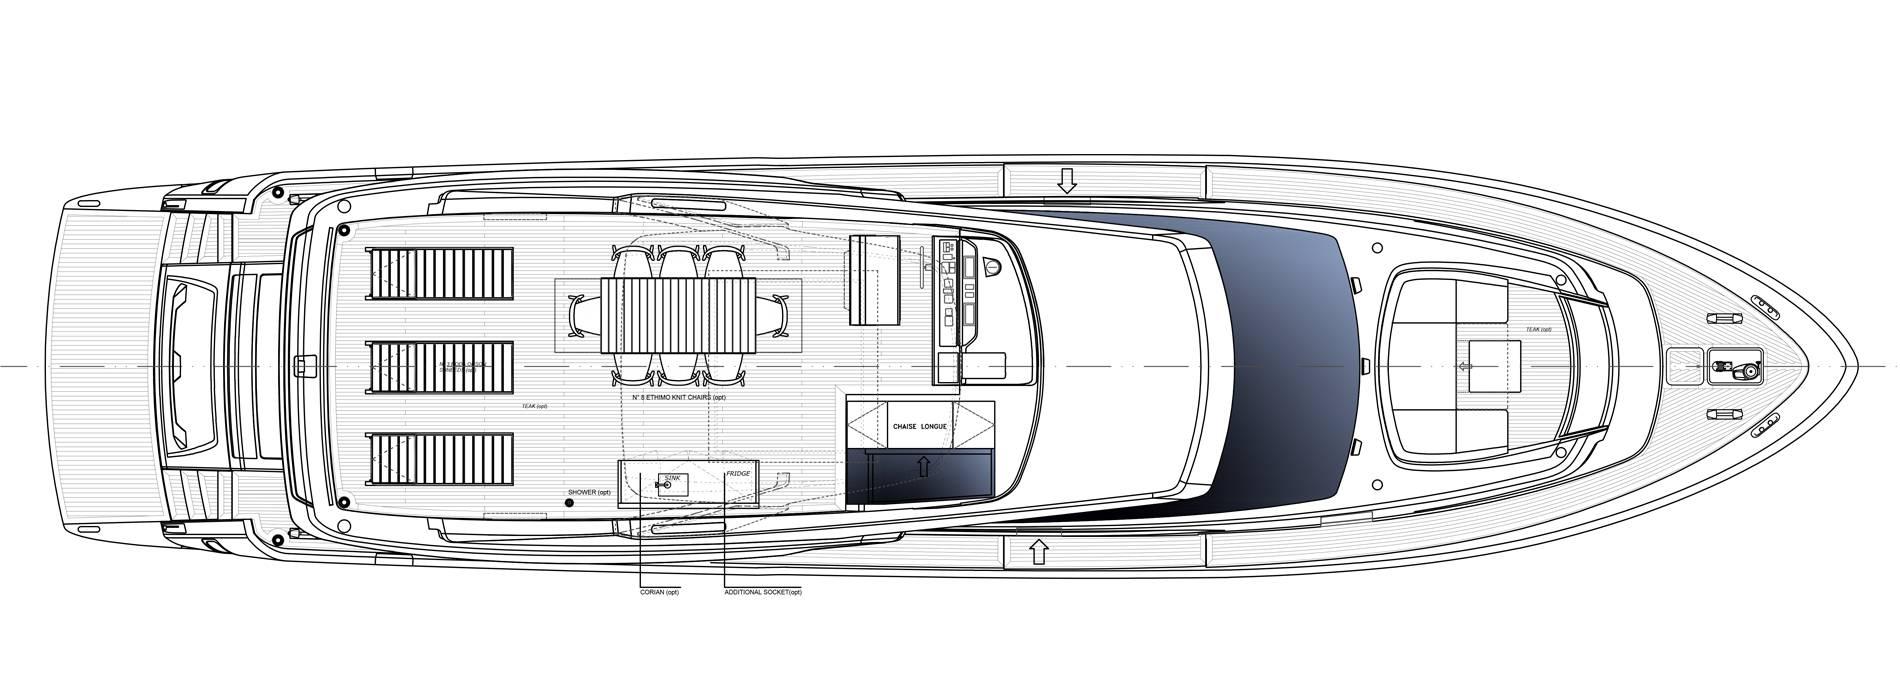 Sanlorenzo Yachts SL78-695 Флайбридж